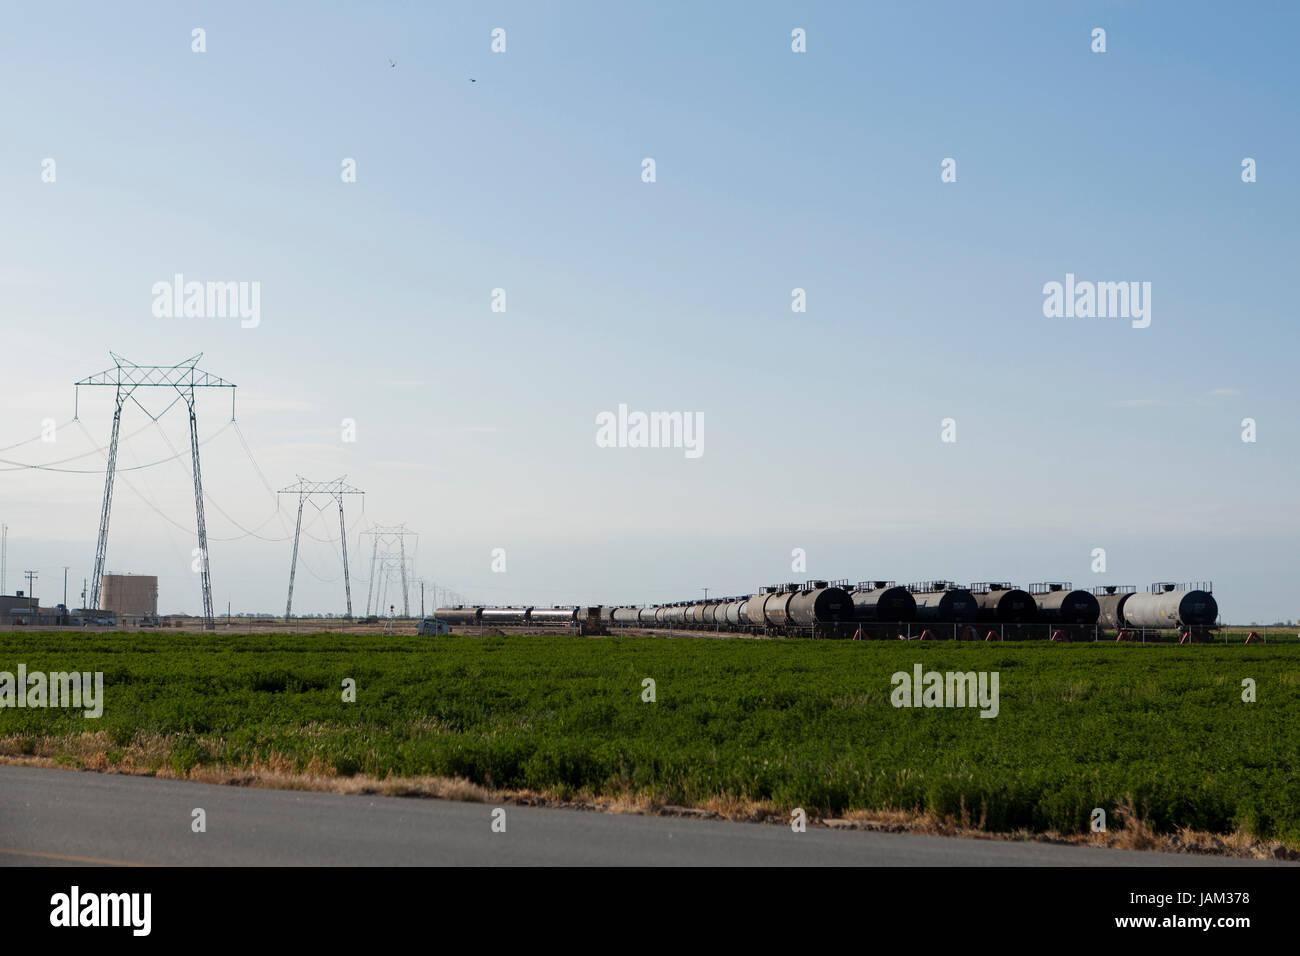 DOT 111 rail tank cars - California USA - Stock Image